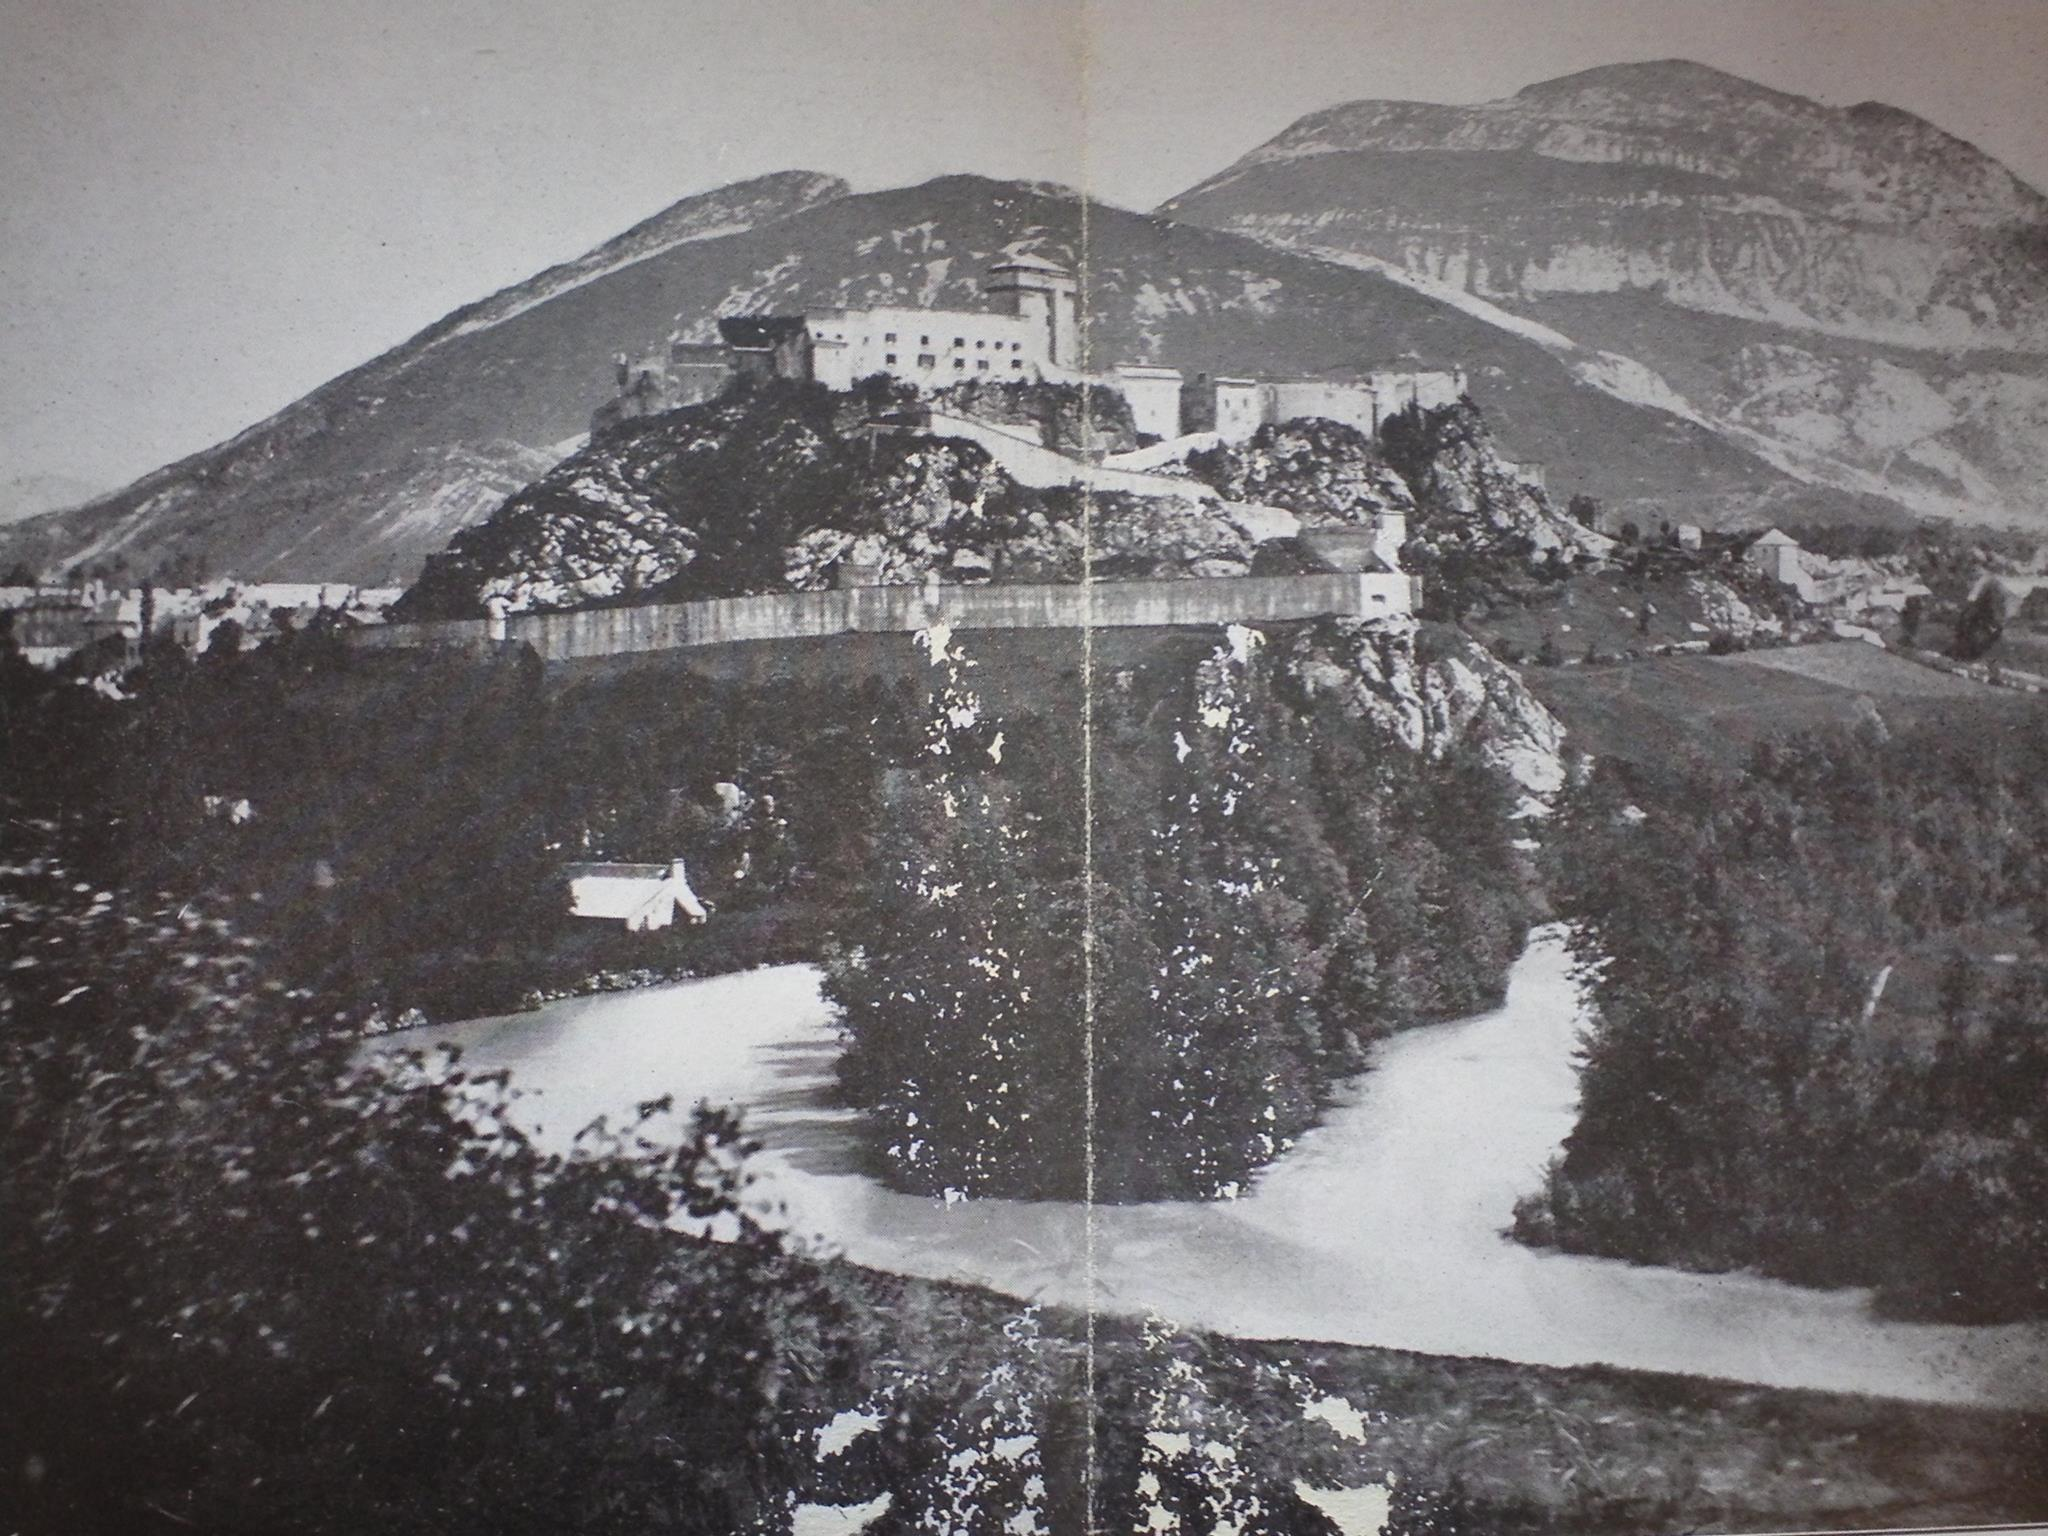 A #Lourdes c'era un'isola